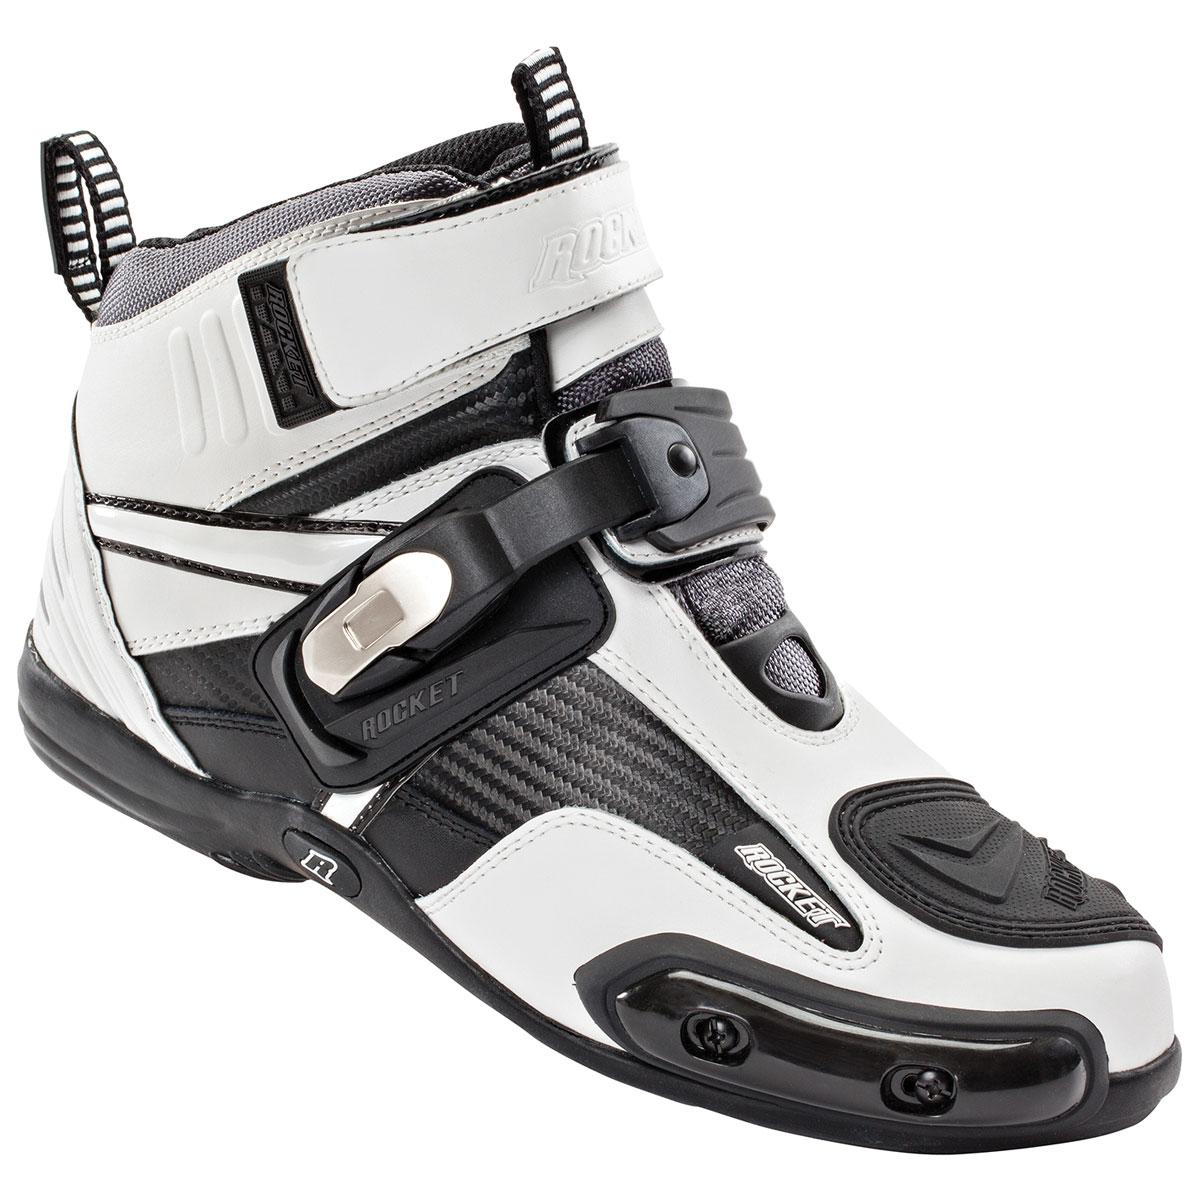 Joe Rocket Men's Atomic White/Black Boots